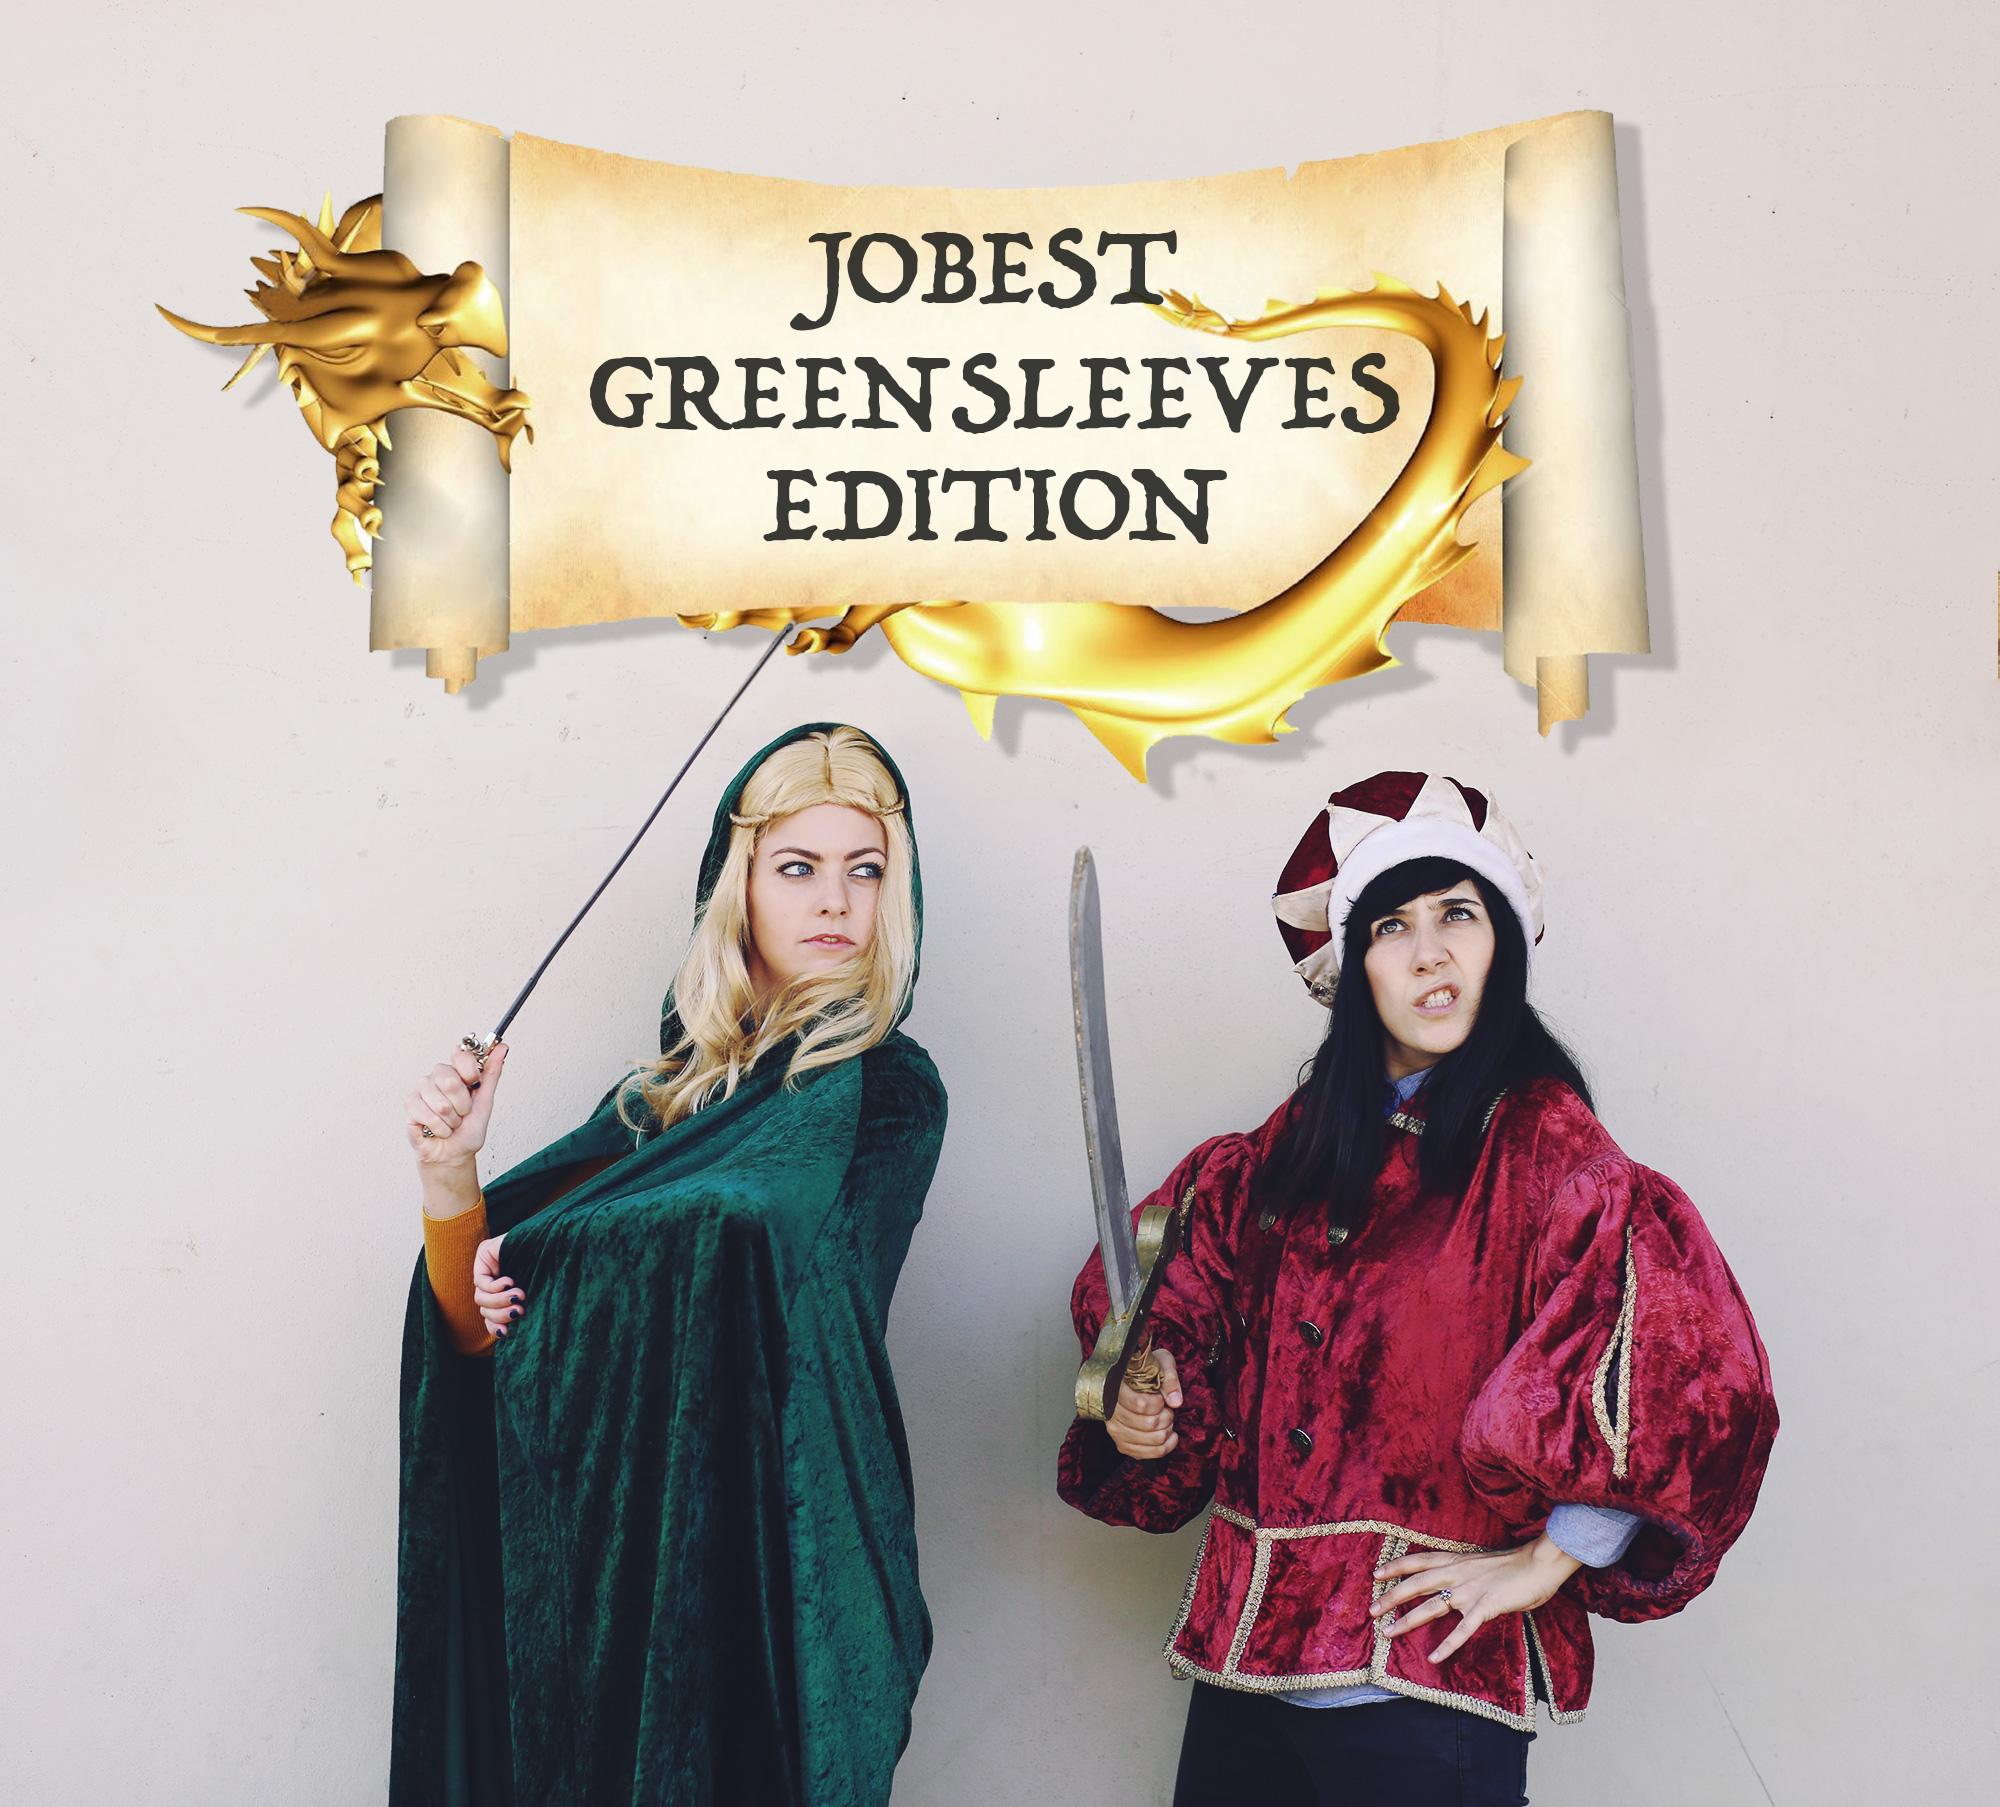 Jobest Greensleeves Edition